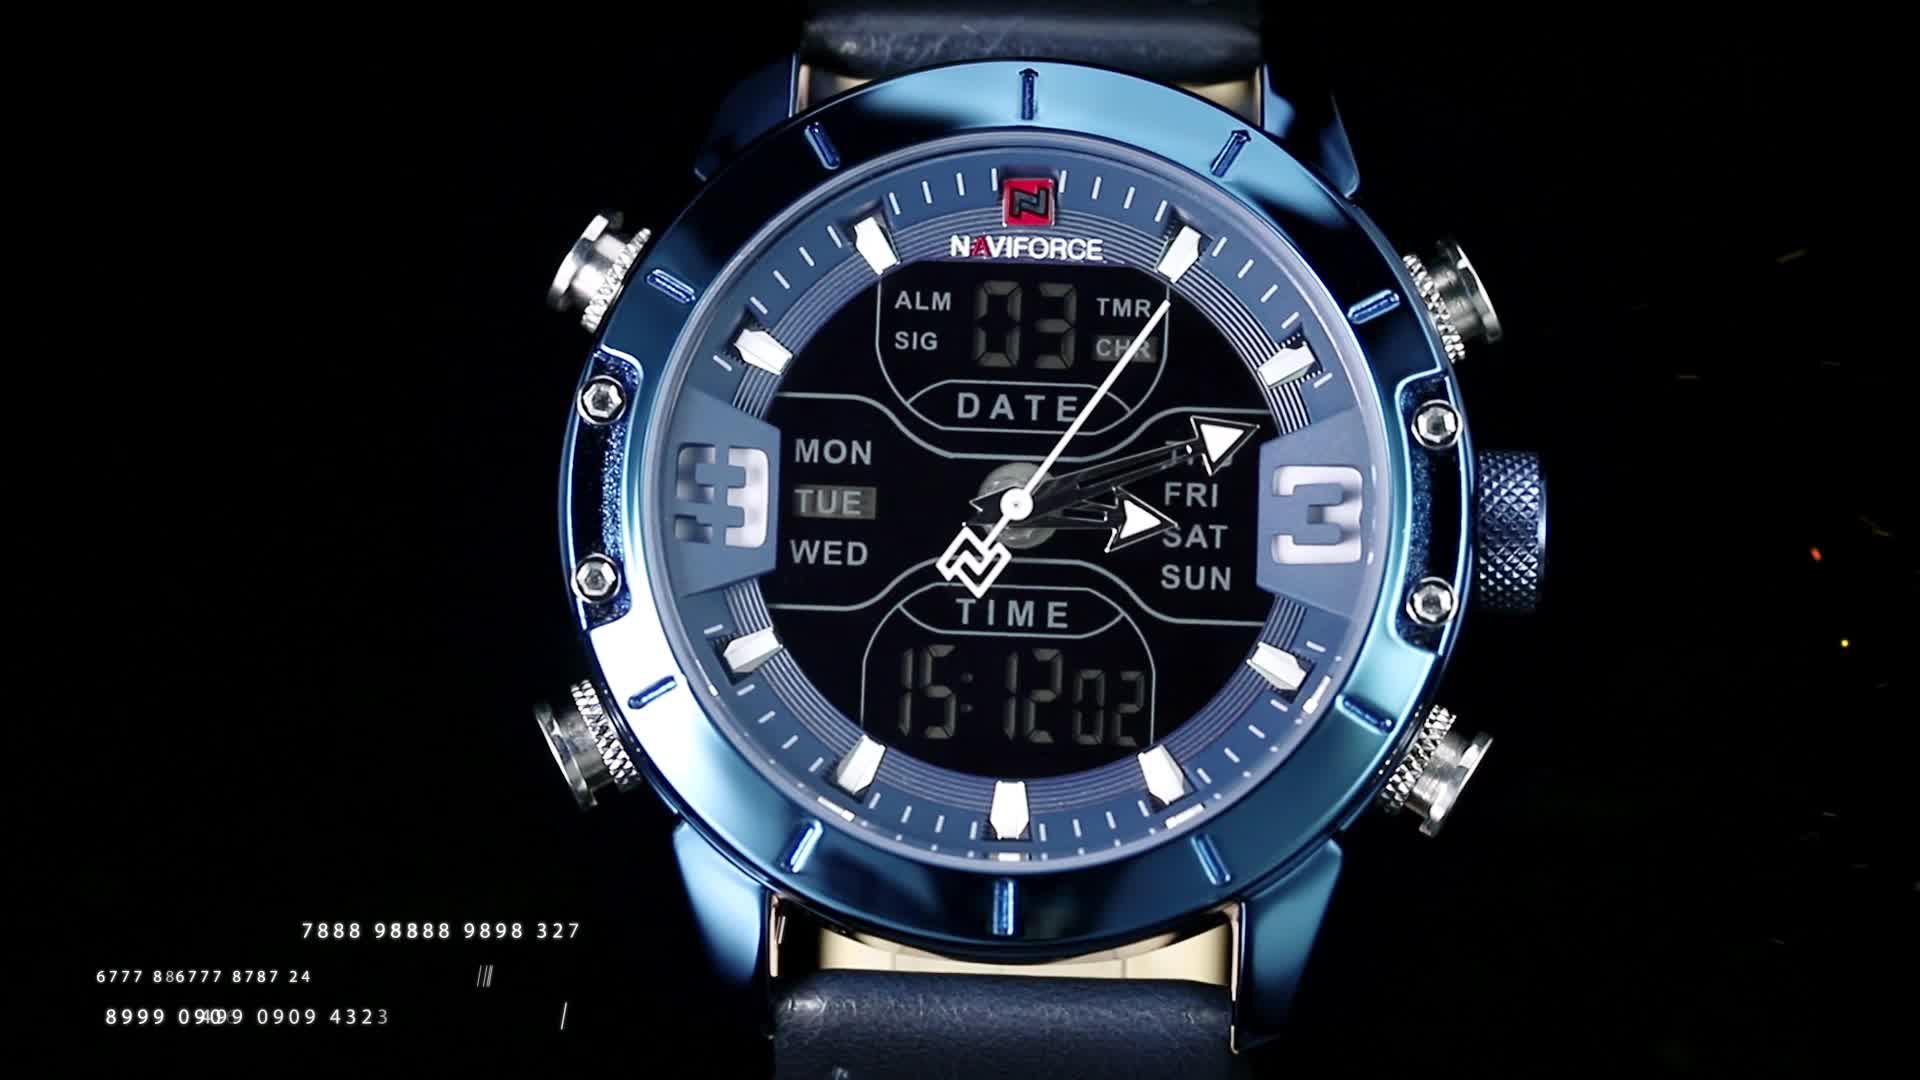 Naviforce 9153L wristwatch 2020 hot sale Top Luxury Brand Quartz Clock men watches navi force watch